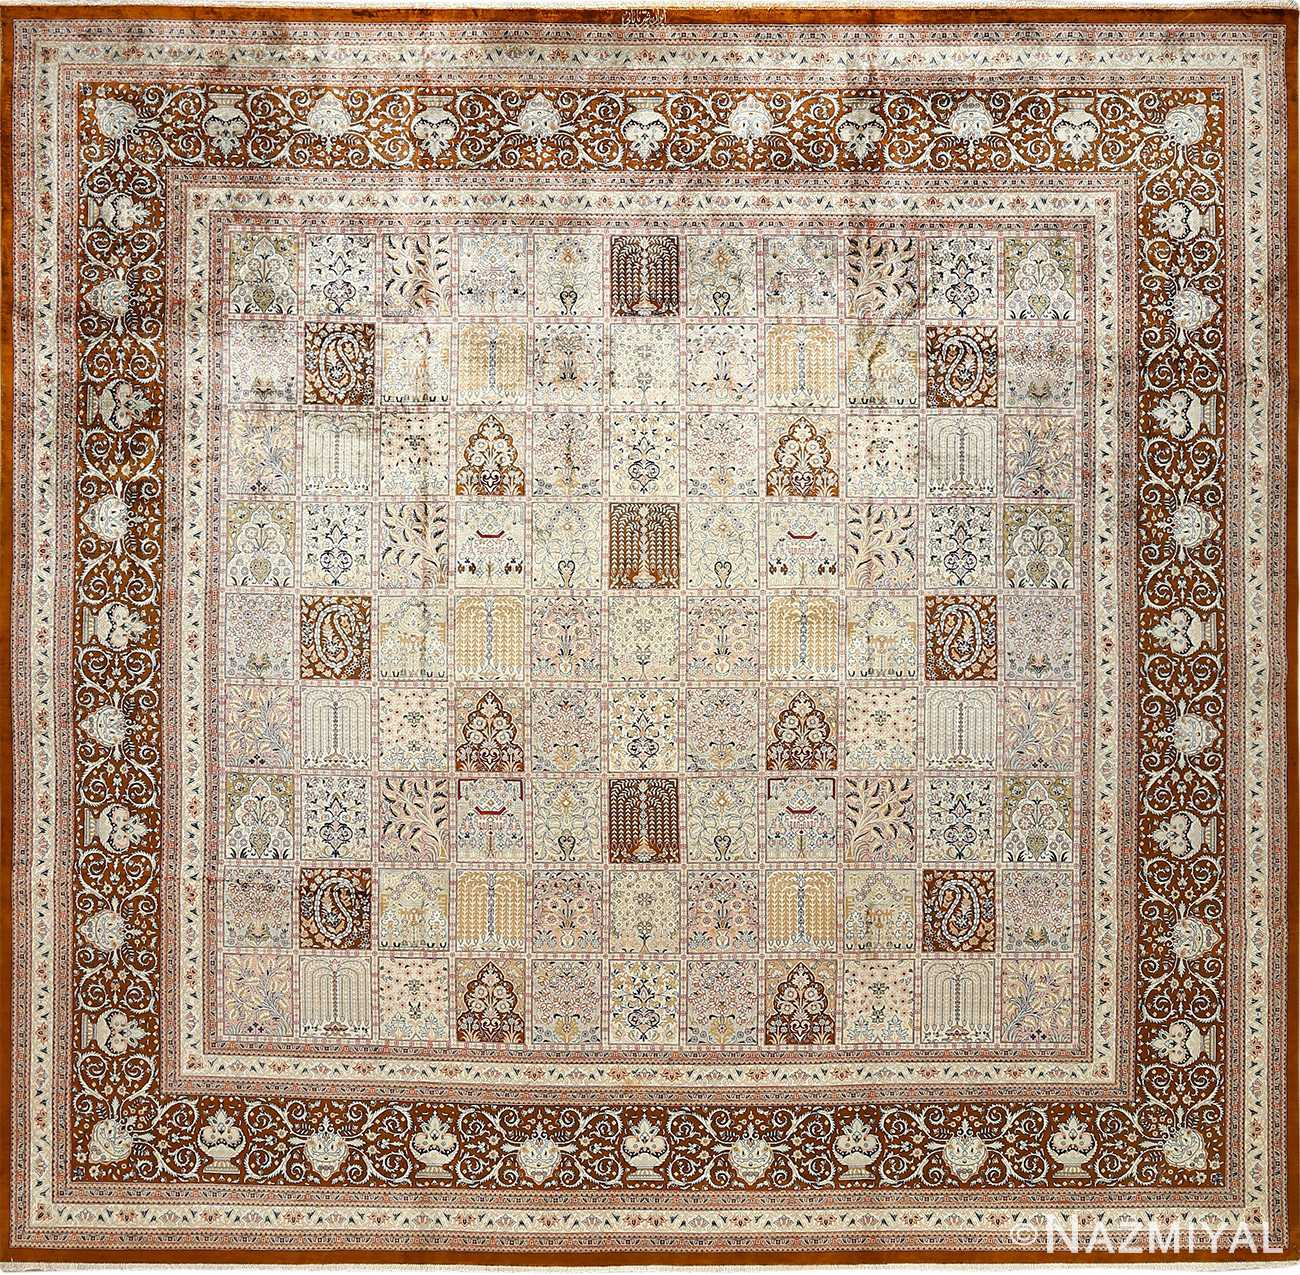 fine square garden design silk qum persian rug 51084 Nazmiyal